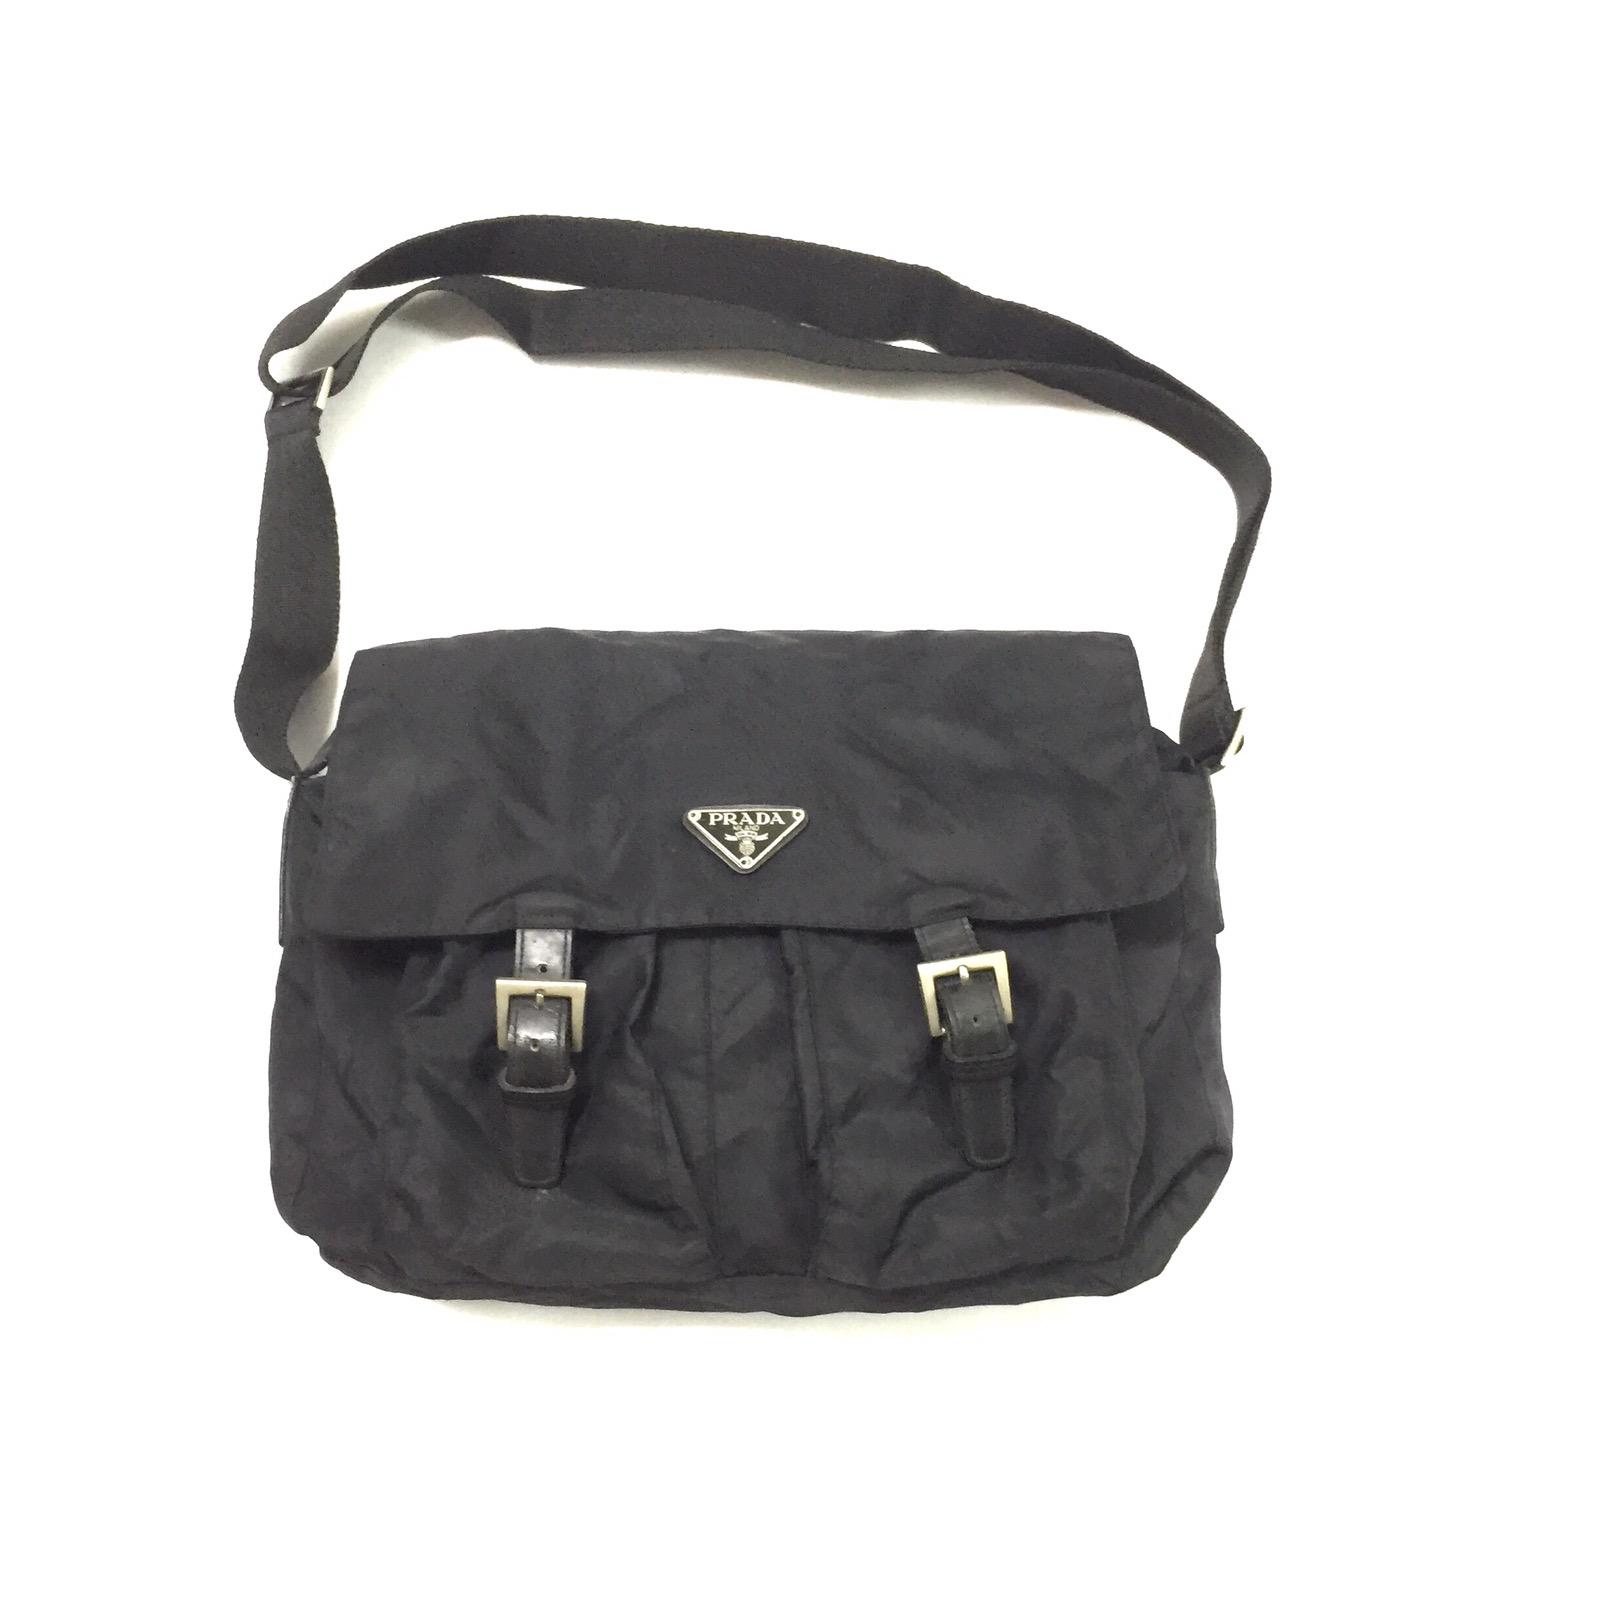 83883d15cfa5 ... inexpensive vintage prada. prada nylon sling bag acdc3 dd73c